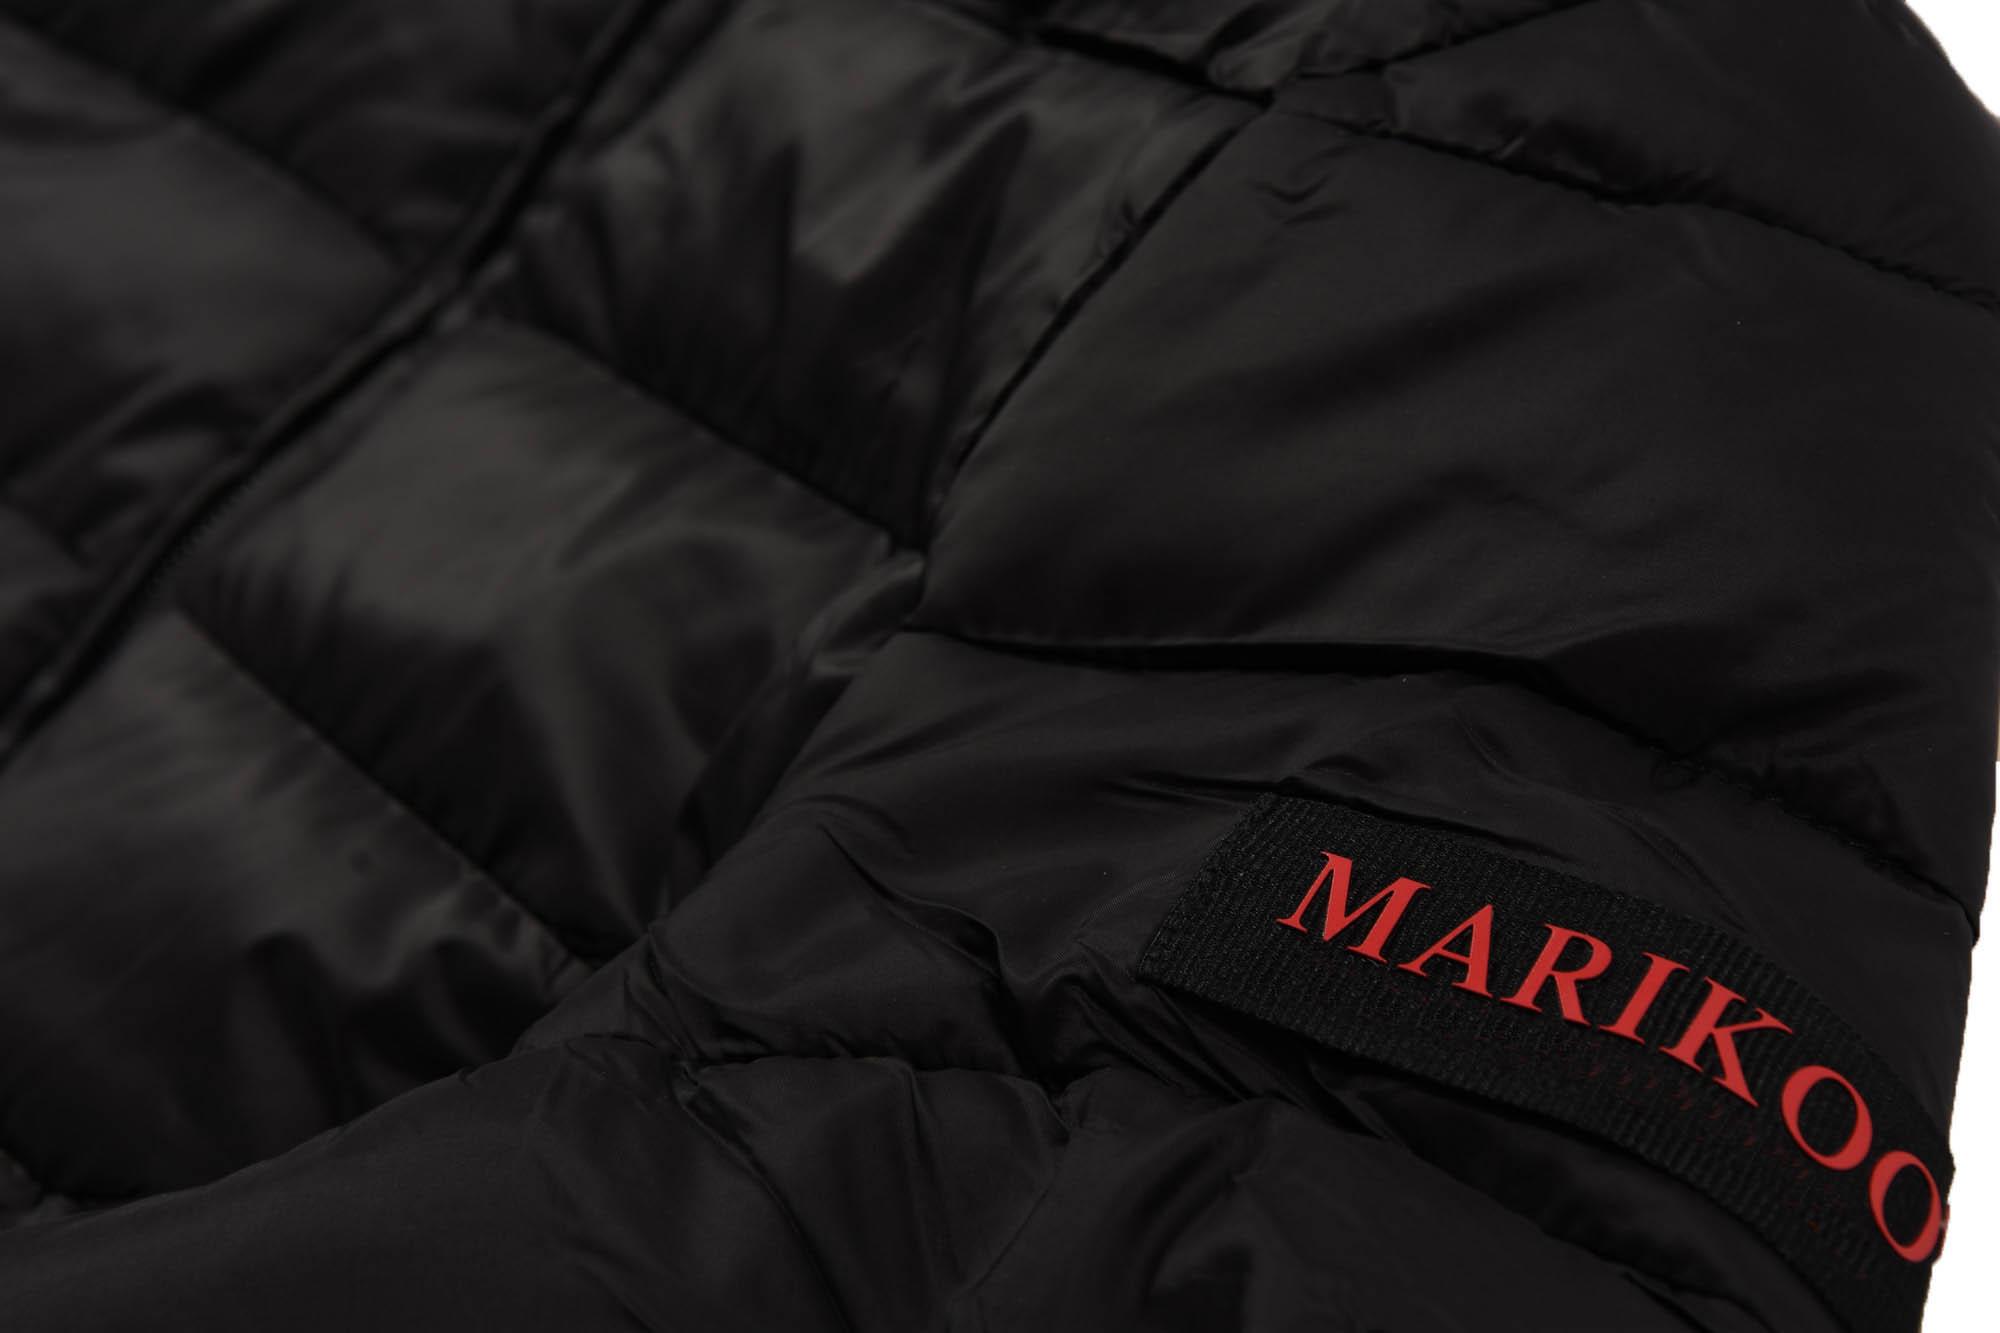 Marikoo-Lucy-Damen-Jacke-Steppjacke-Ubergangsjacke-gesteppt-Stepp-NEU-B651 Indexbild 6